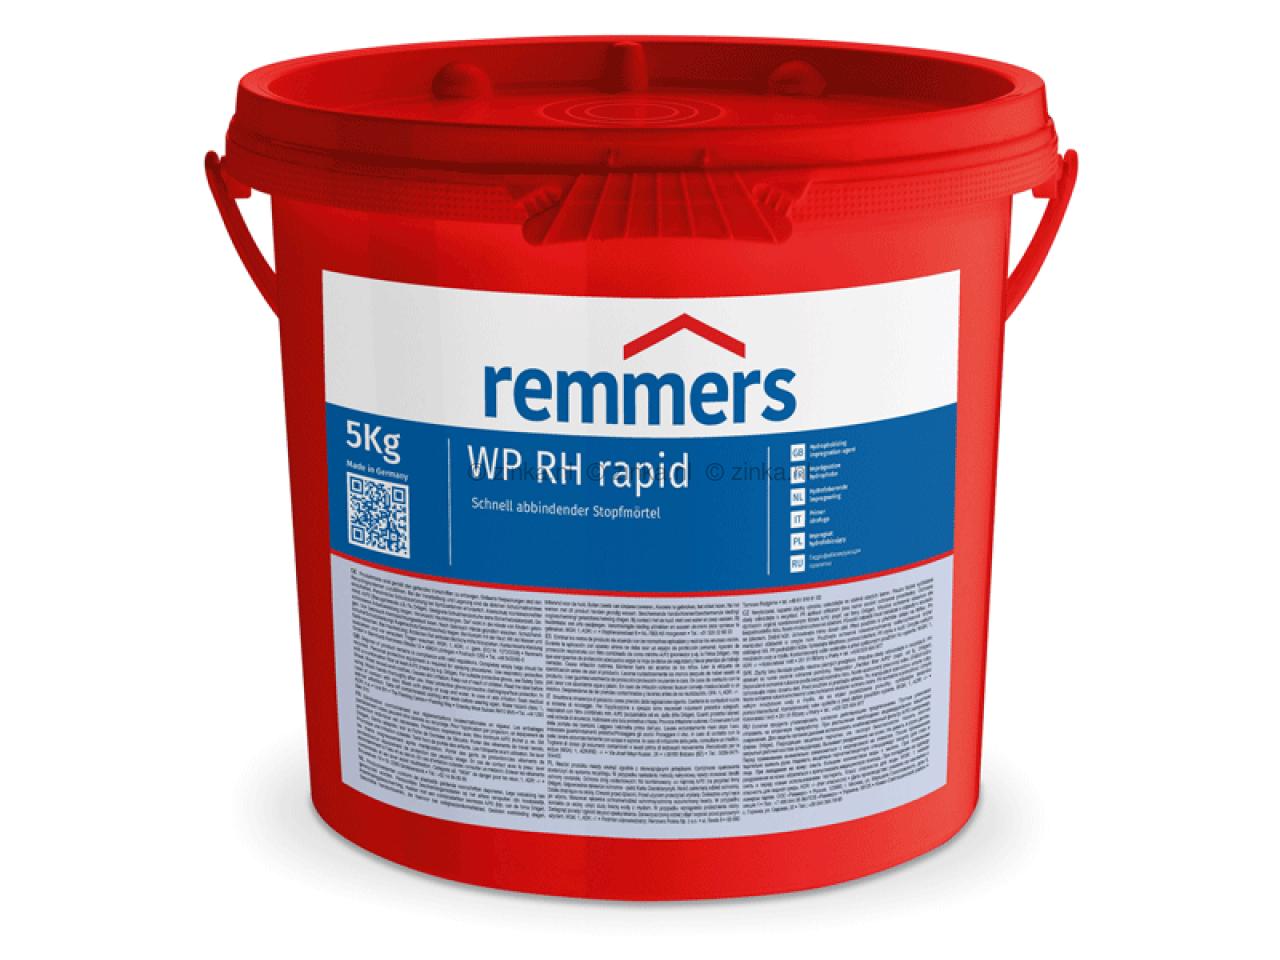 wp rh rapid